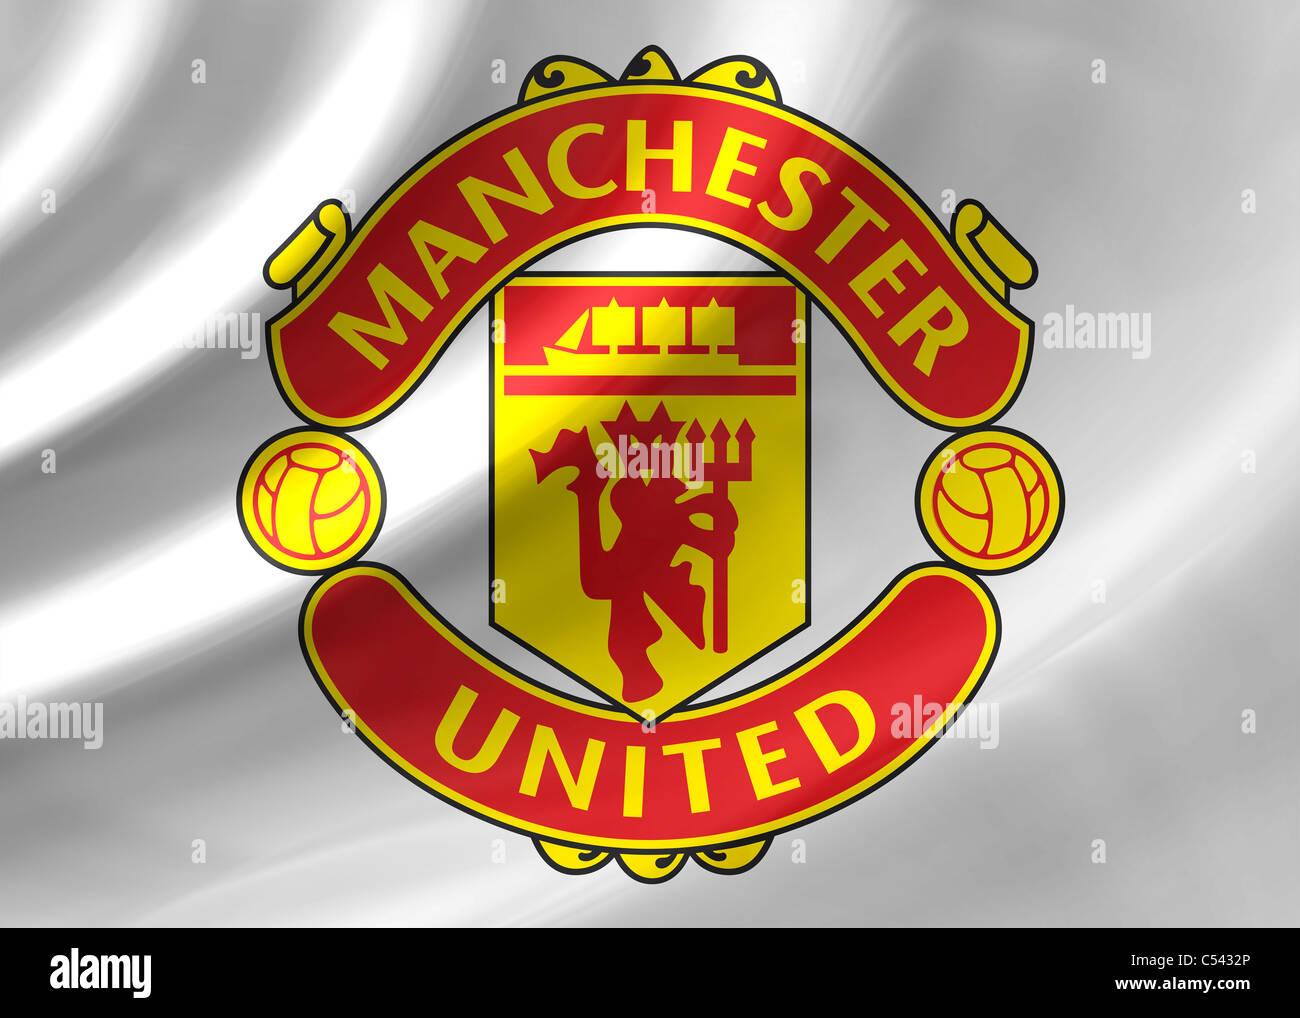 Manchester united flag logo symbol icon stock photo 37584254 alamy manchester united flag logo symbol icon voltagebd Images